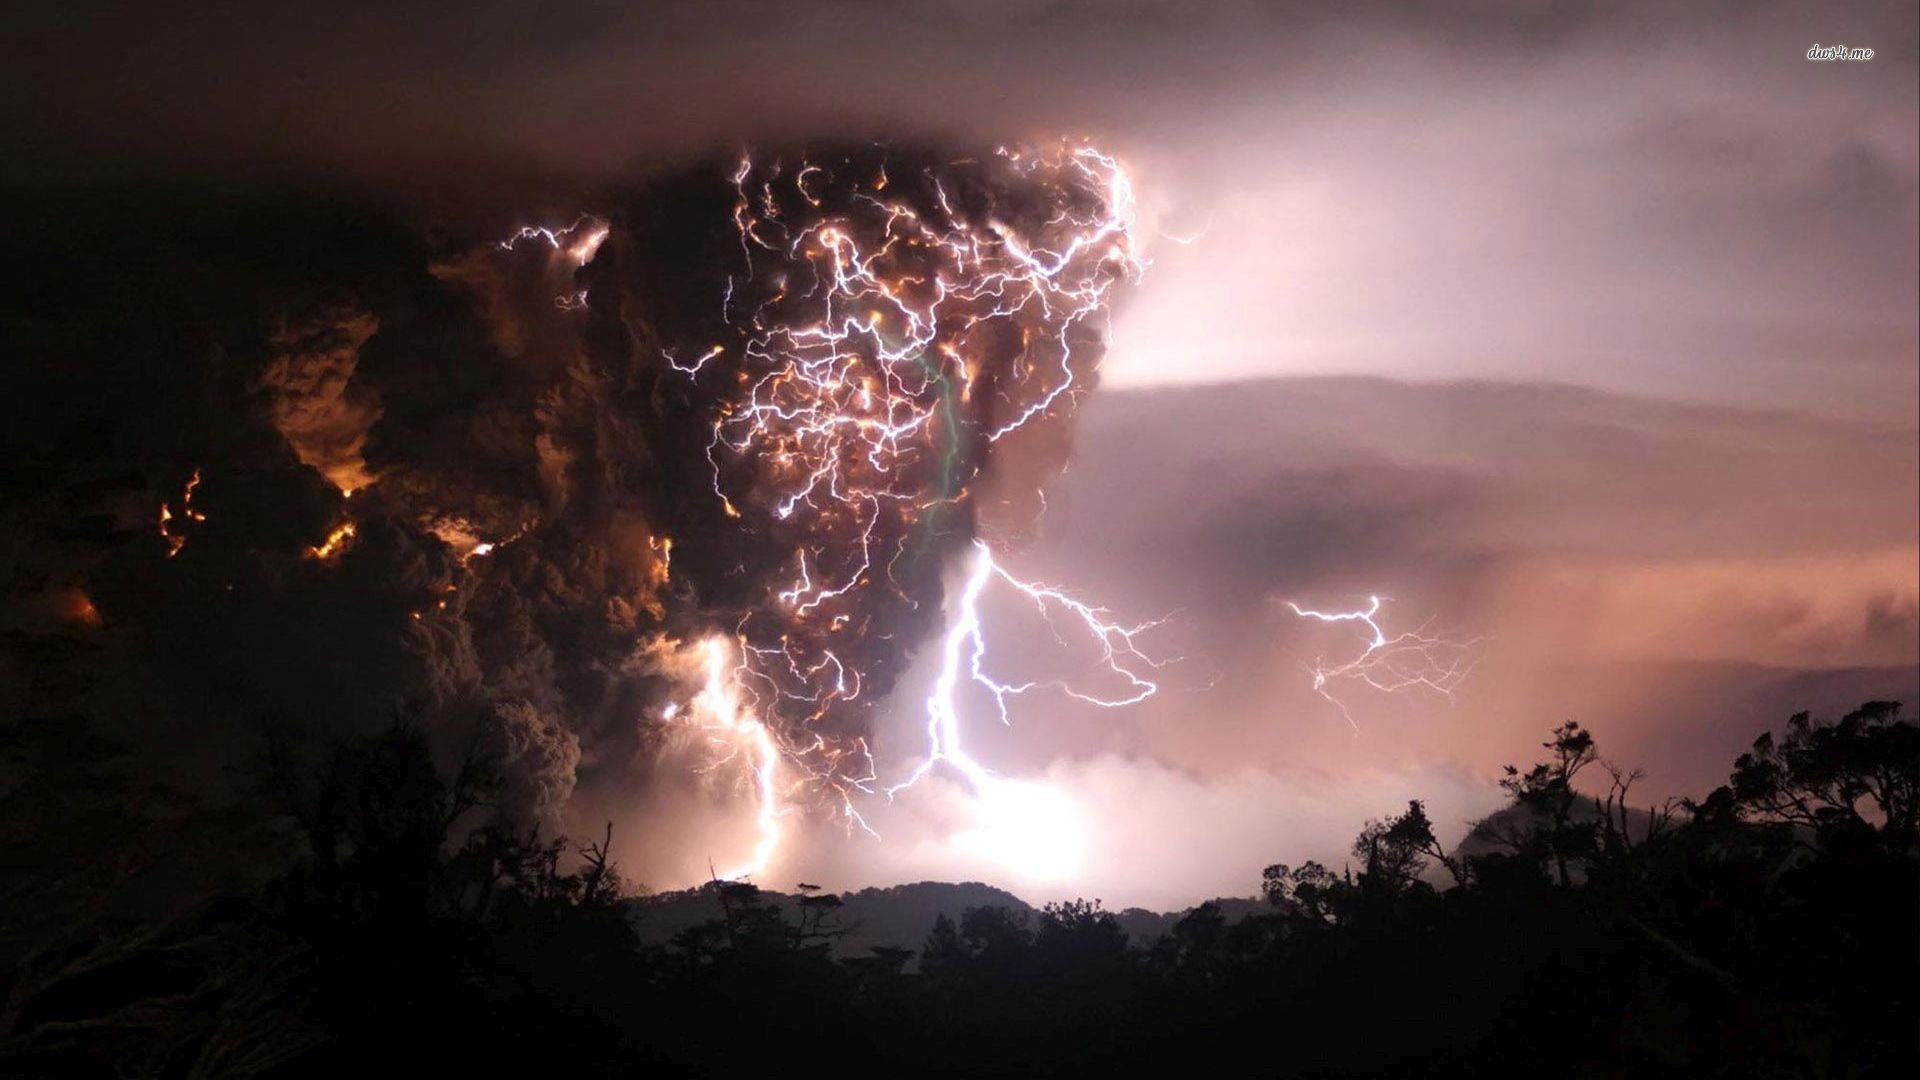 Dark Cloud Lightning wallpaper – Nature wallpapers – #29230